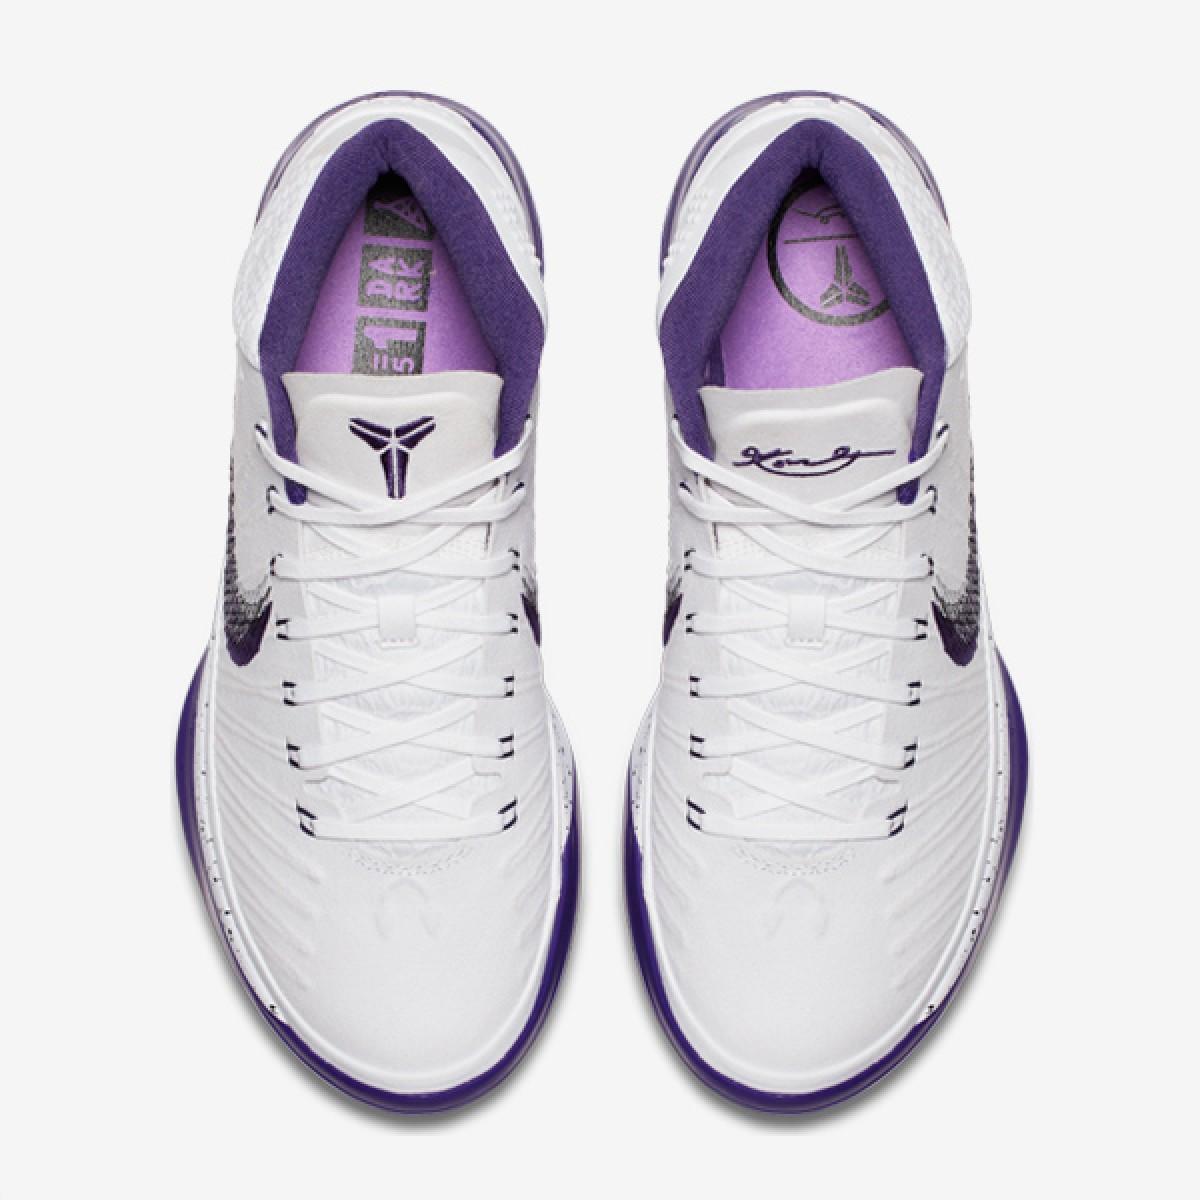 1d5d0cd5f980 Buy Nike Kobe AD Mid  Baseline  Basketball shoes   sneakers